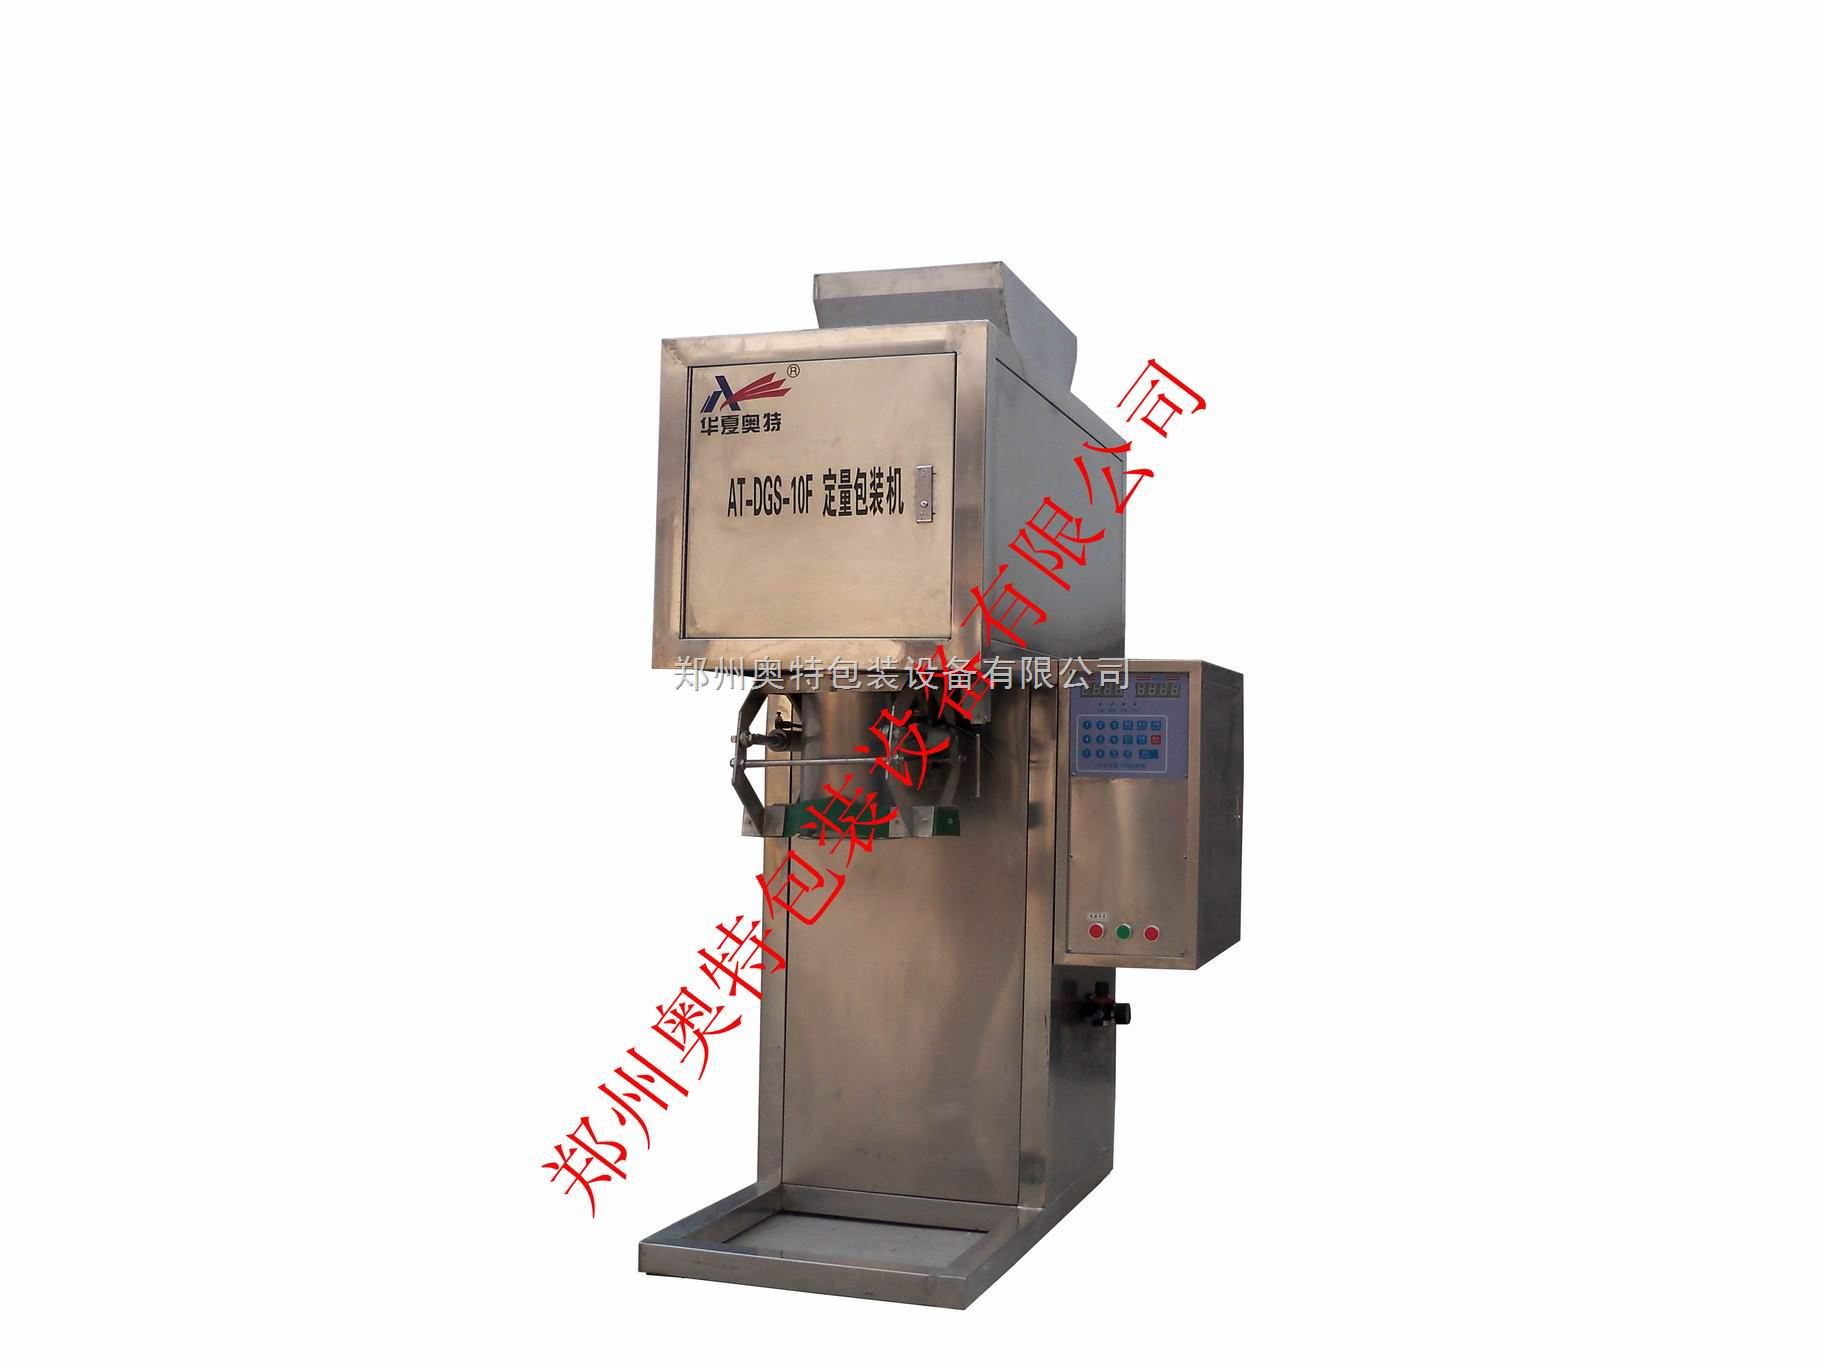 AT-DGS-10F粉体包装机